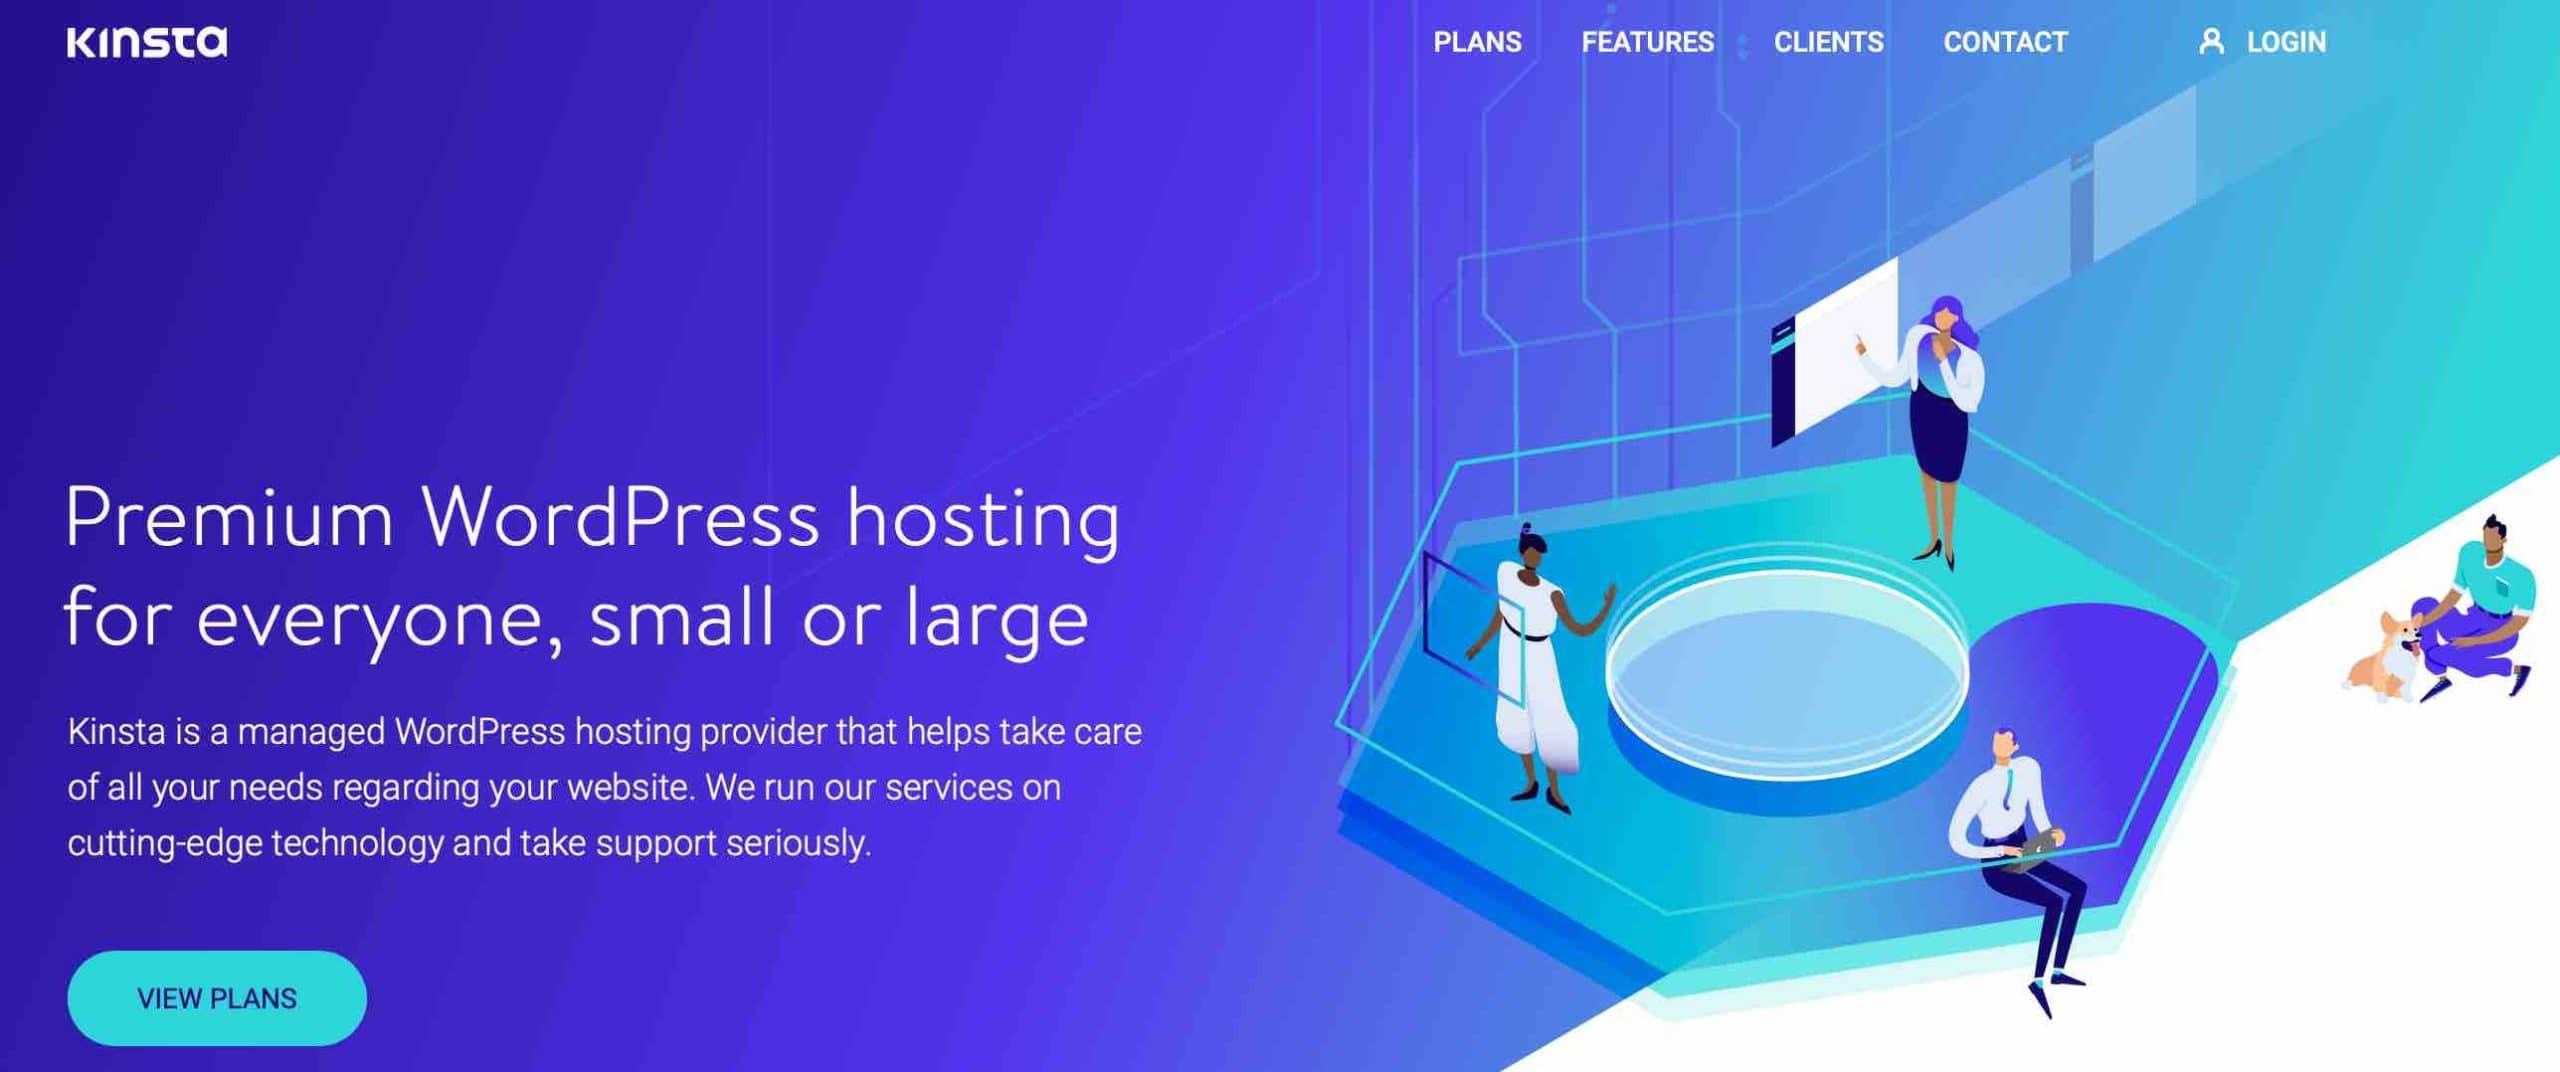 Kinsta is a Premium WordPress hosting for everyone